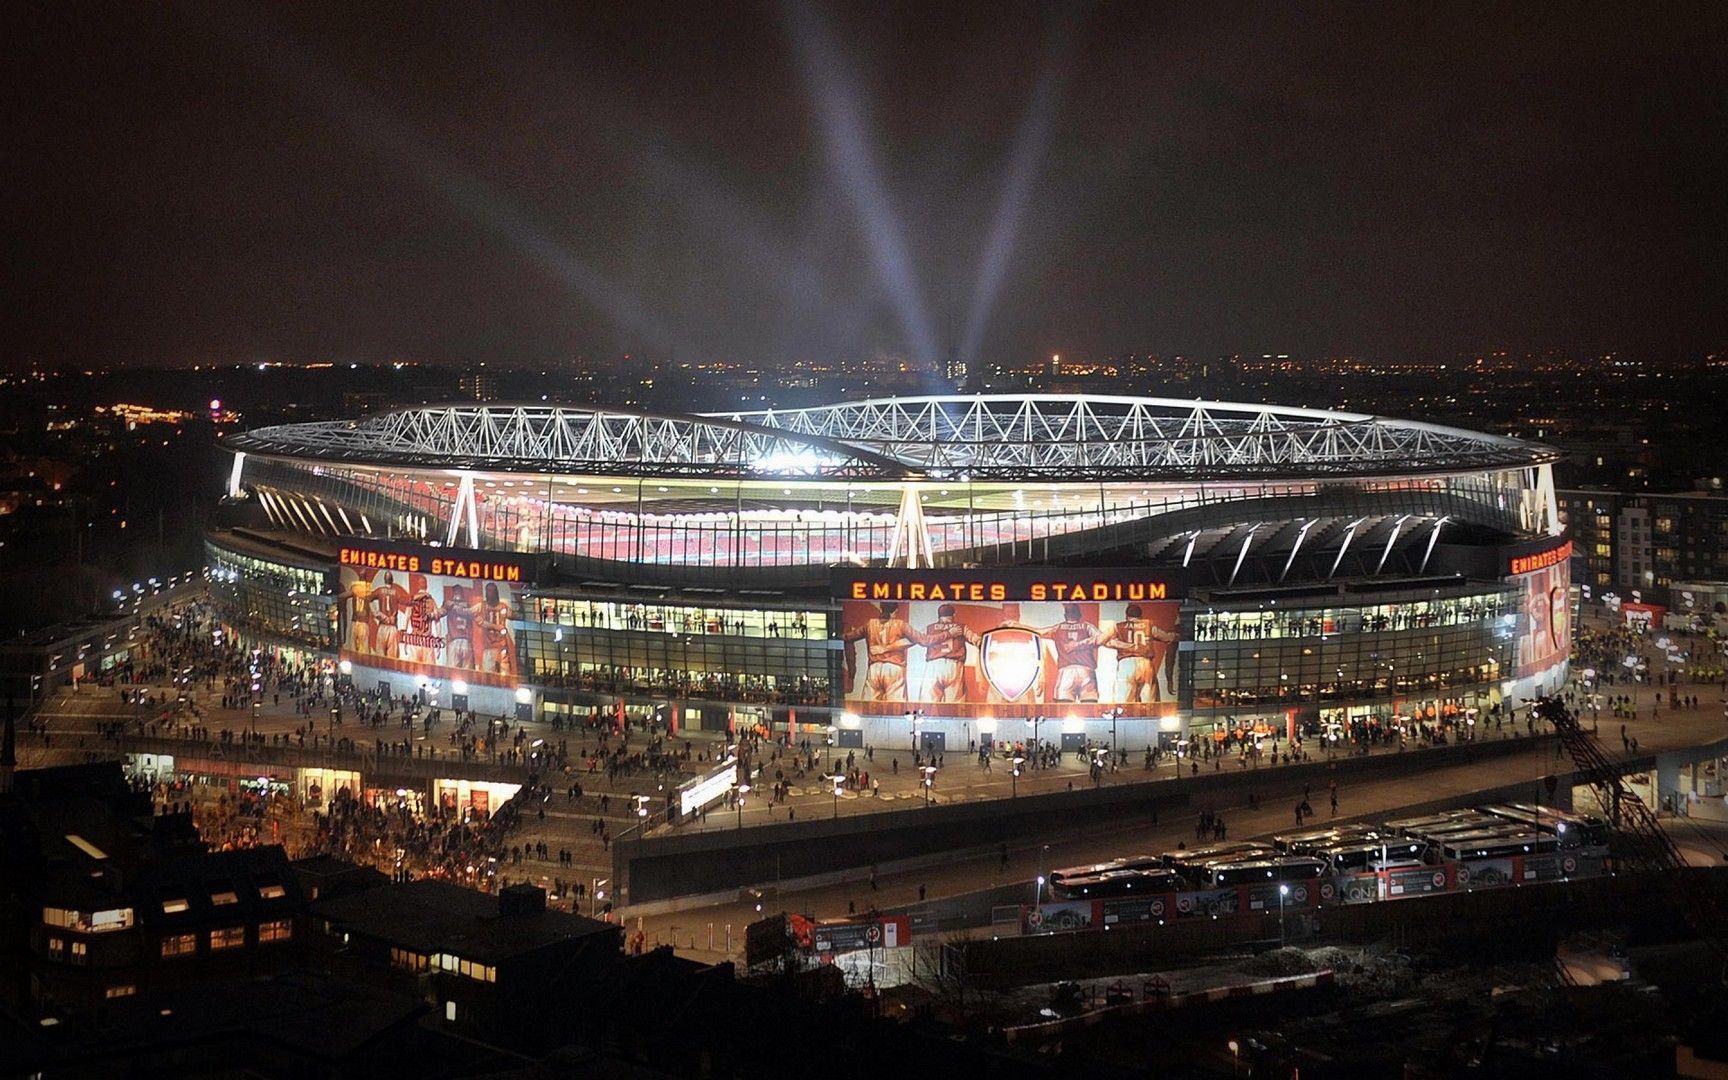 Emirates Stadium Wallpaper Hd 2020 Live Wallpaper Hd Arsenal Wallpapers Stadium Wallpaper Arsenal Stadium